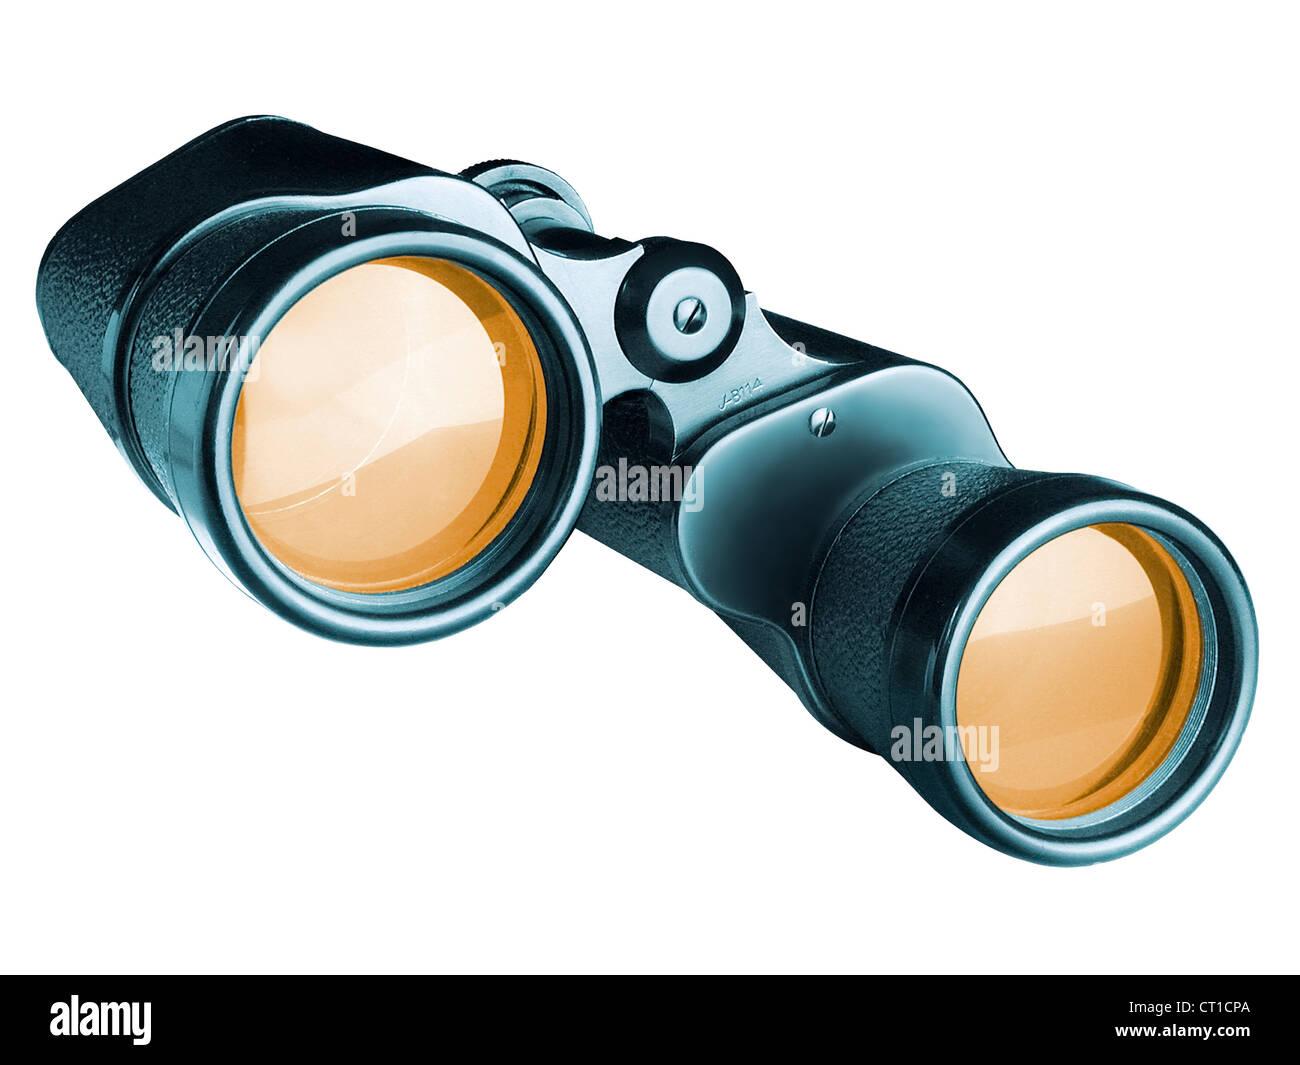 Binoculars on white background - Stock Image